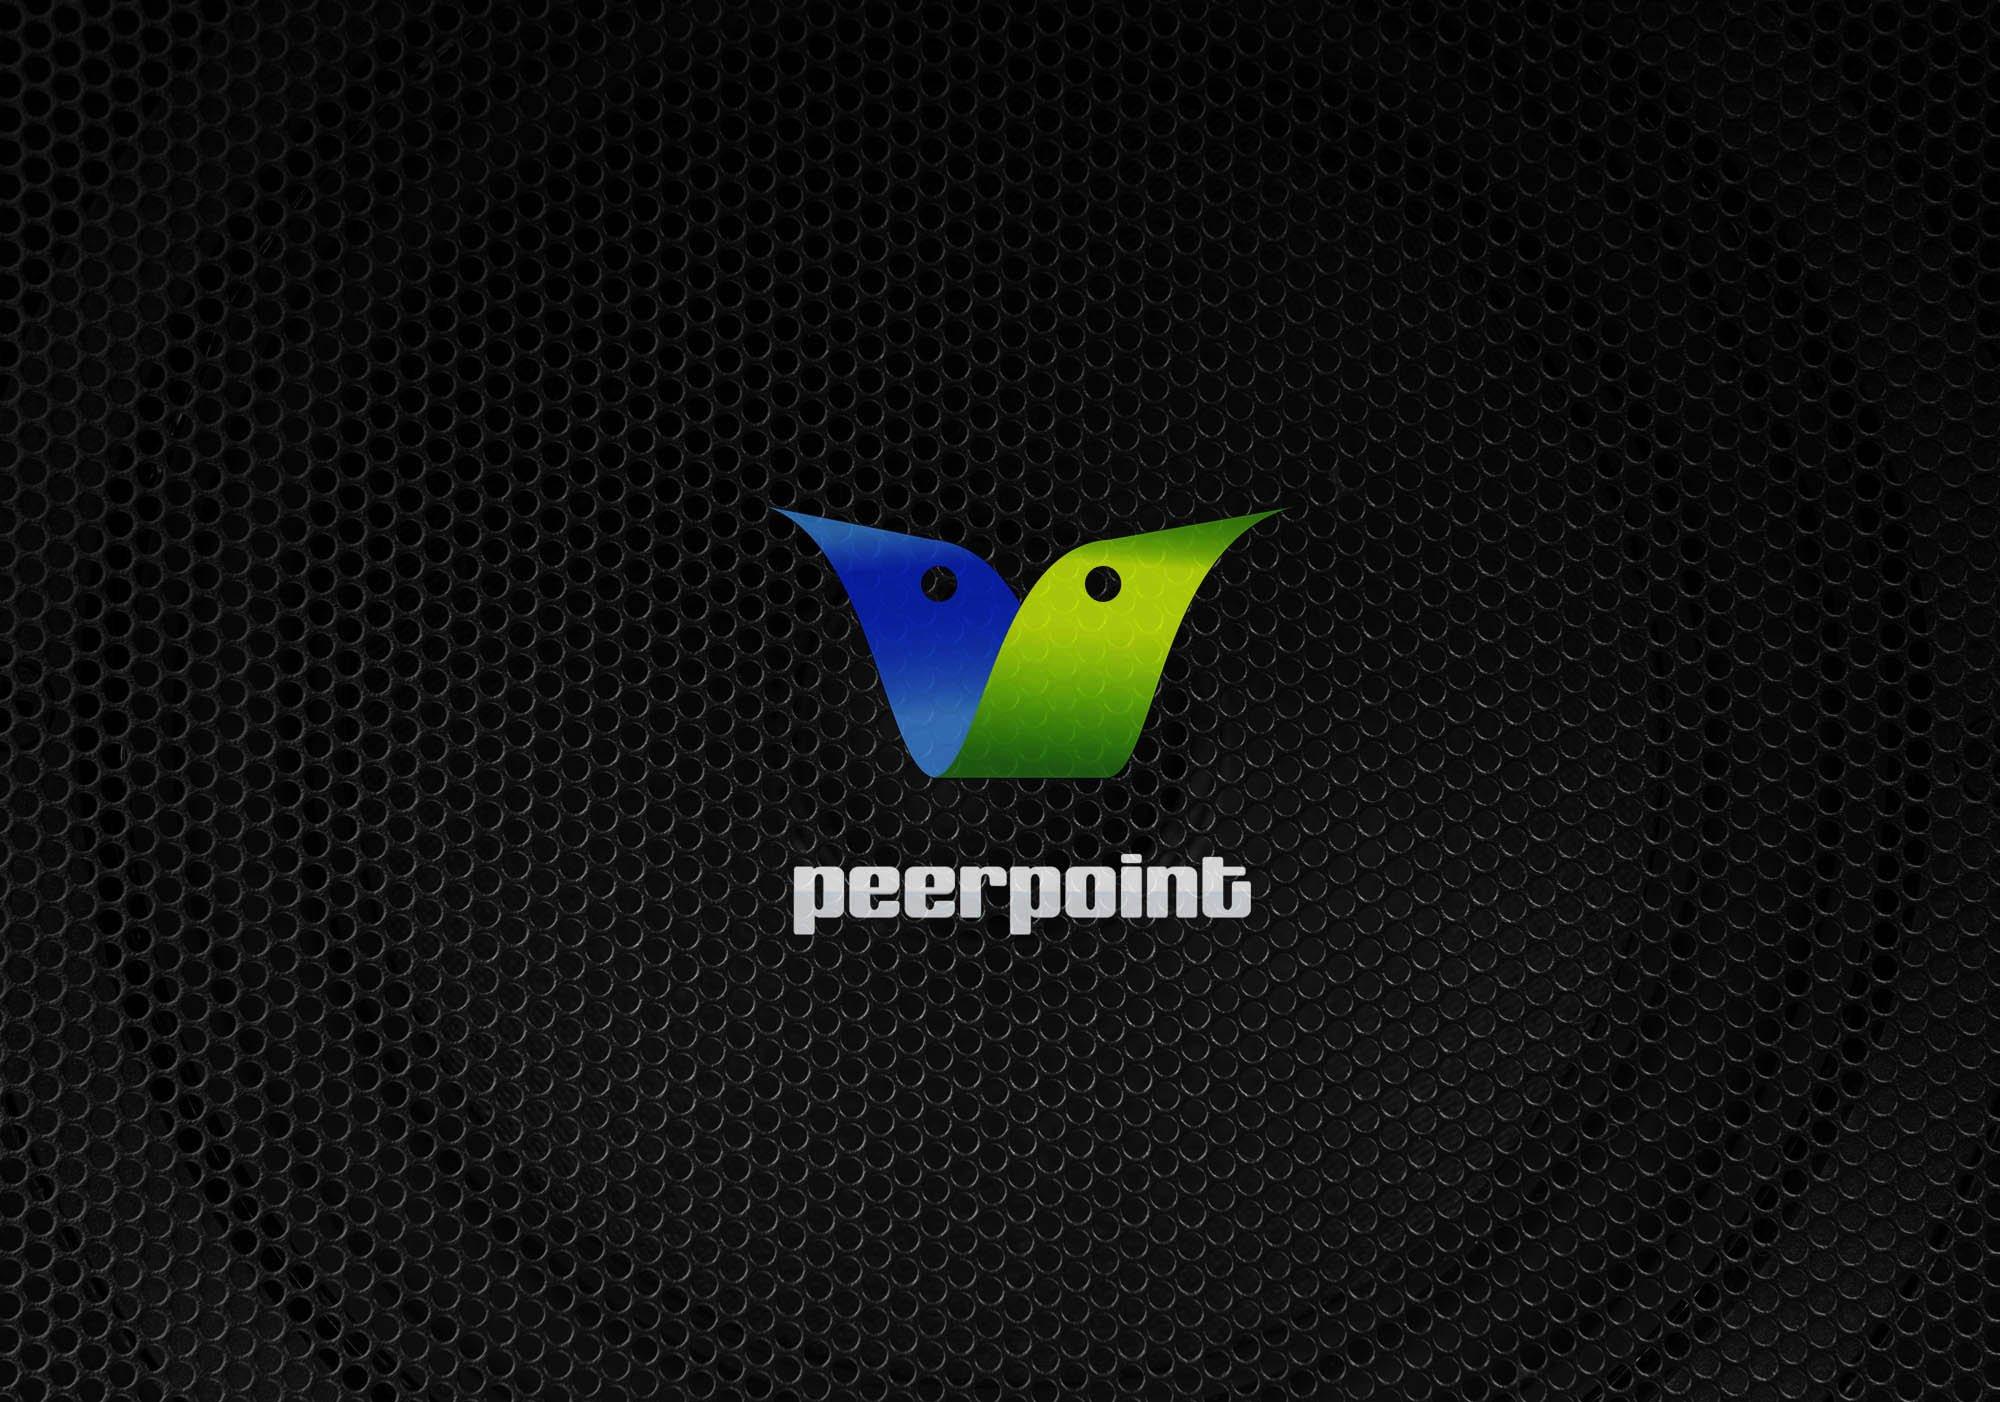 PEERPOINT-LOGO